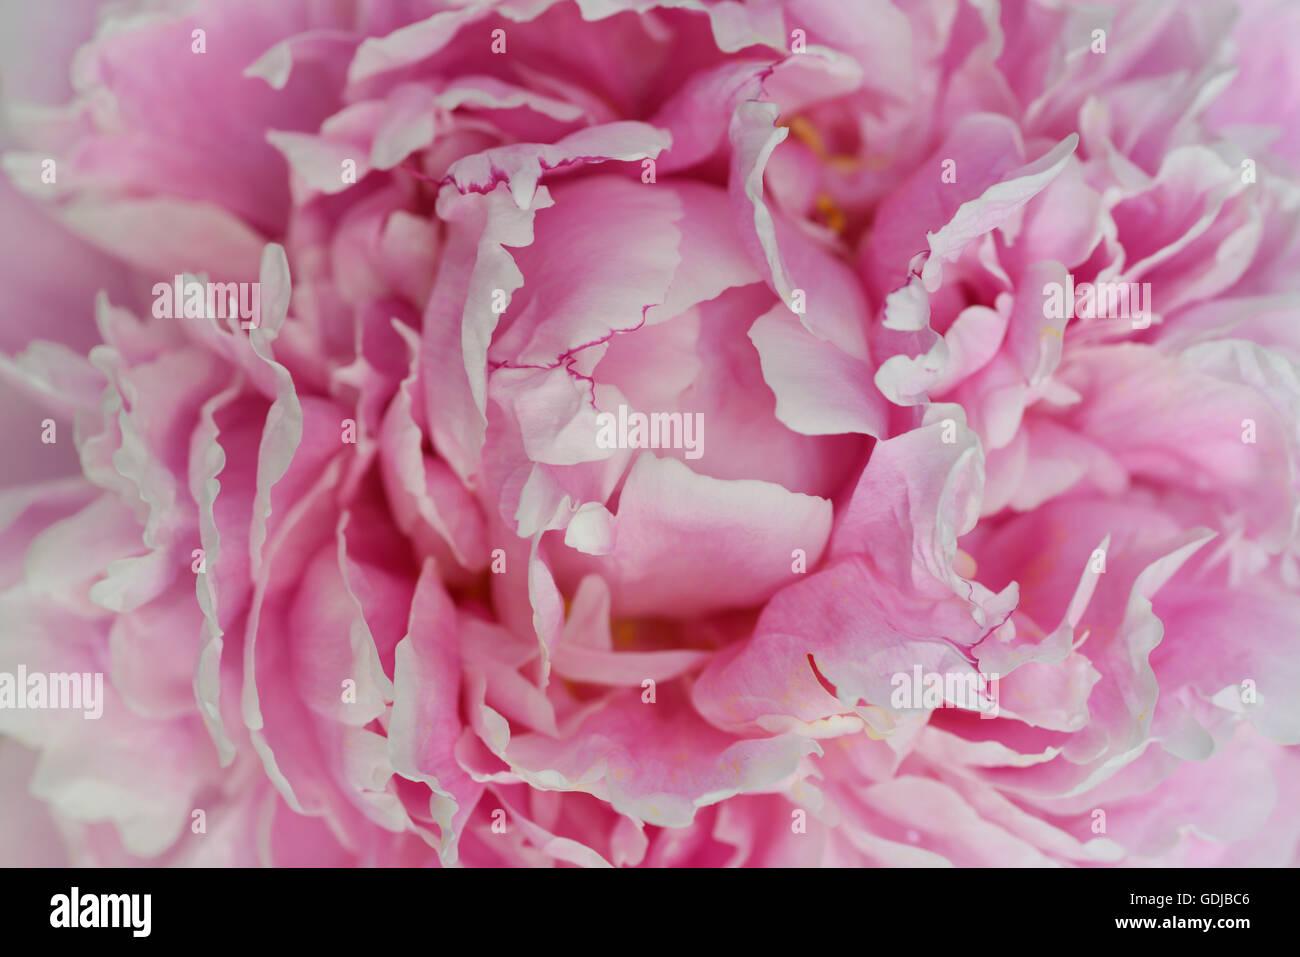 Close up di petali di rosa di una peonia fiore Immagini Stock